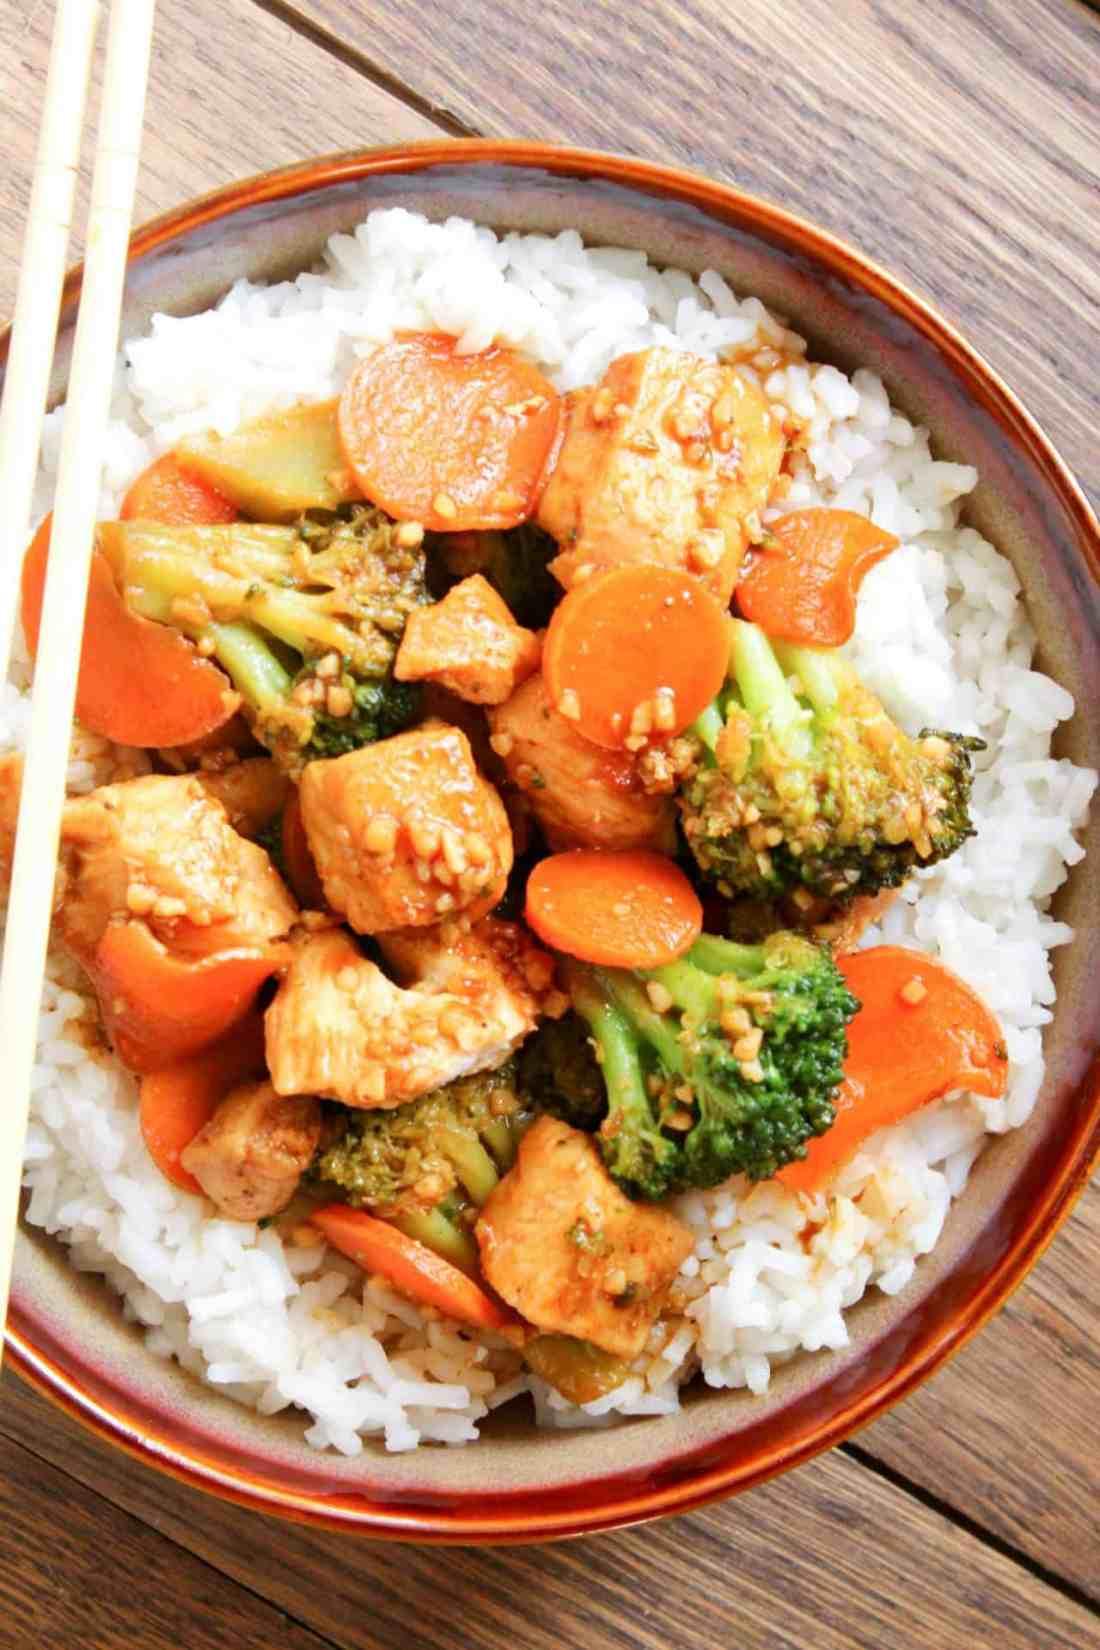 Honey Garlic Chicken Stir Fry With Broccoli  Carrots-3051